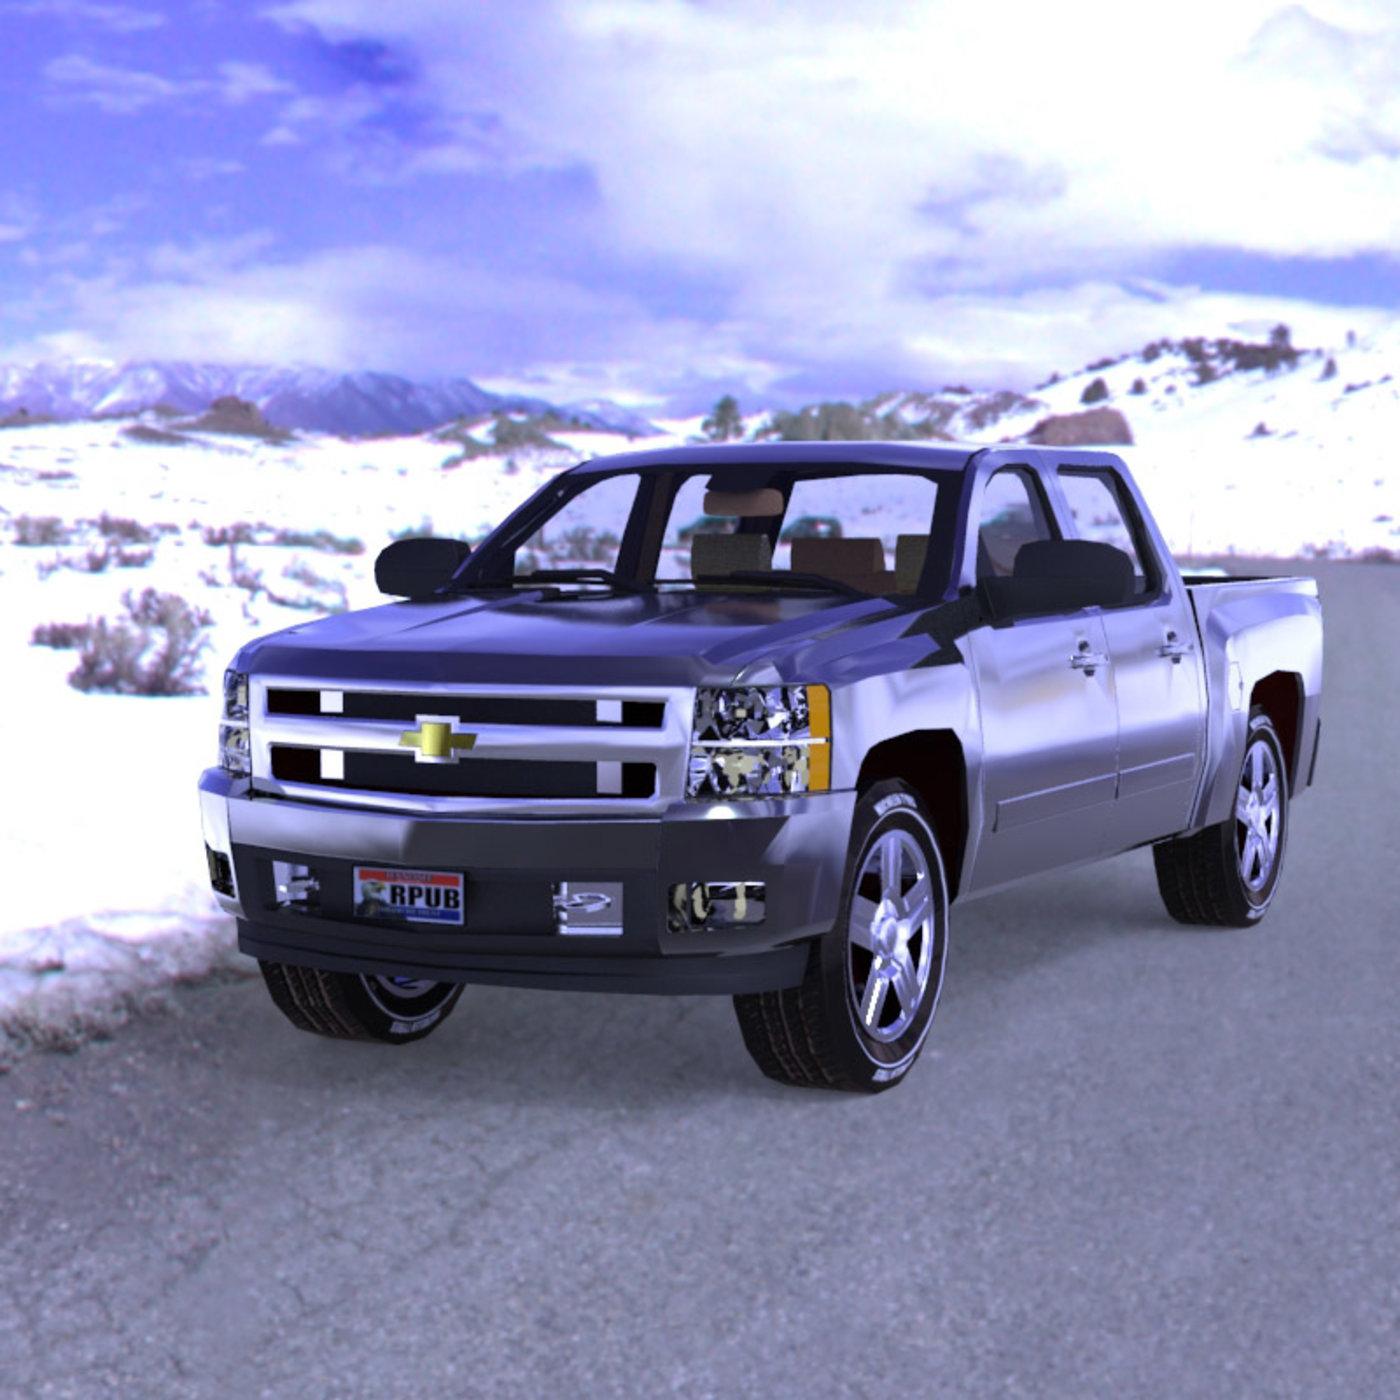 Silverado in the Snow